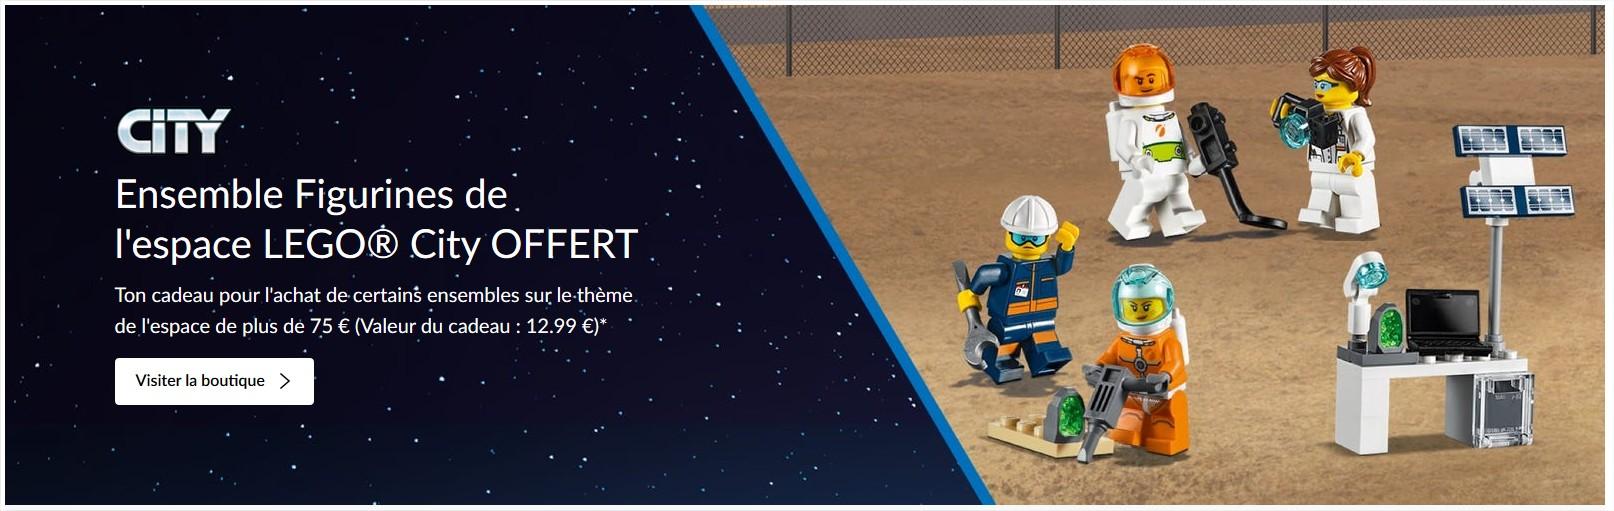 Accessoire figurine lego casque astronaute